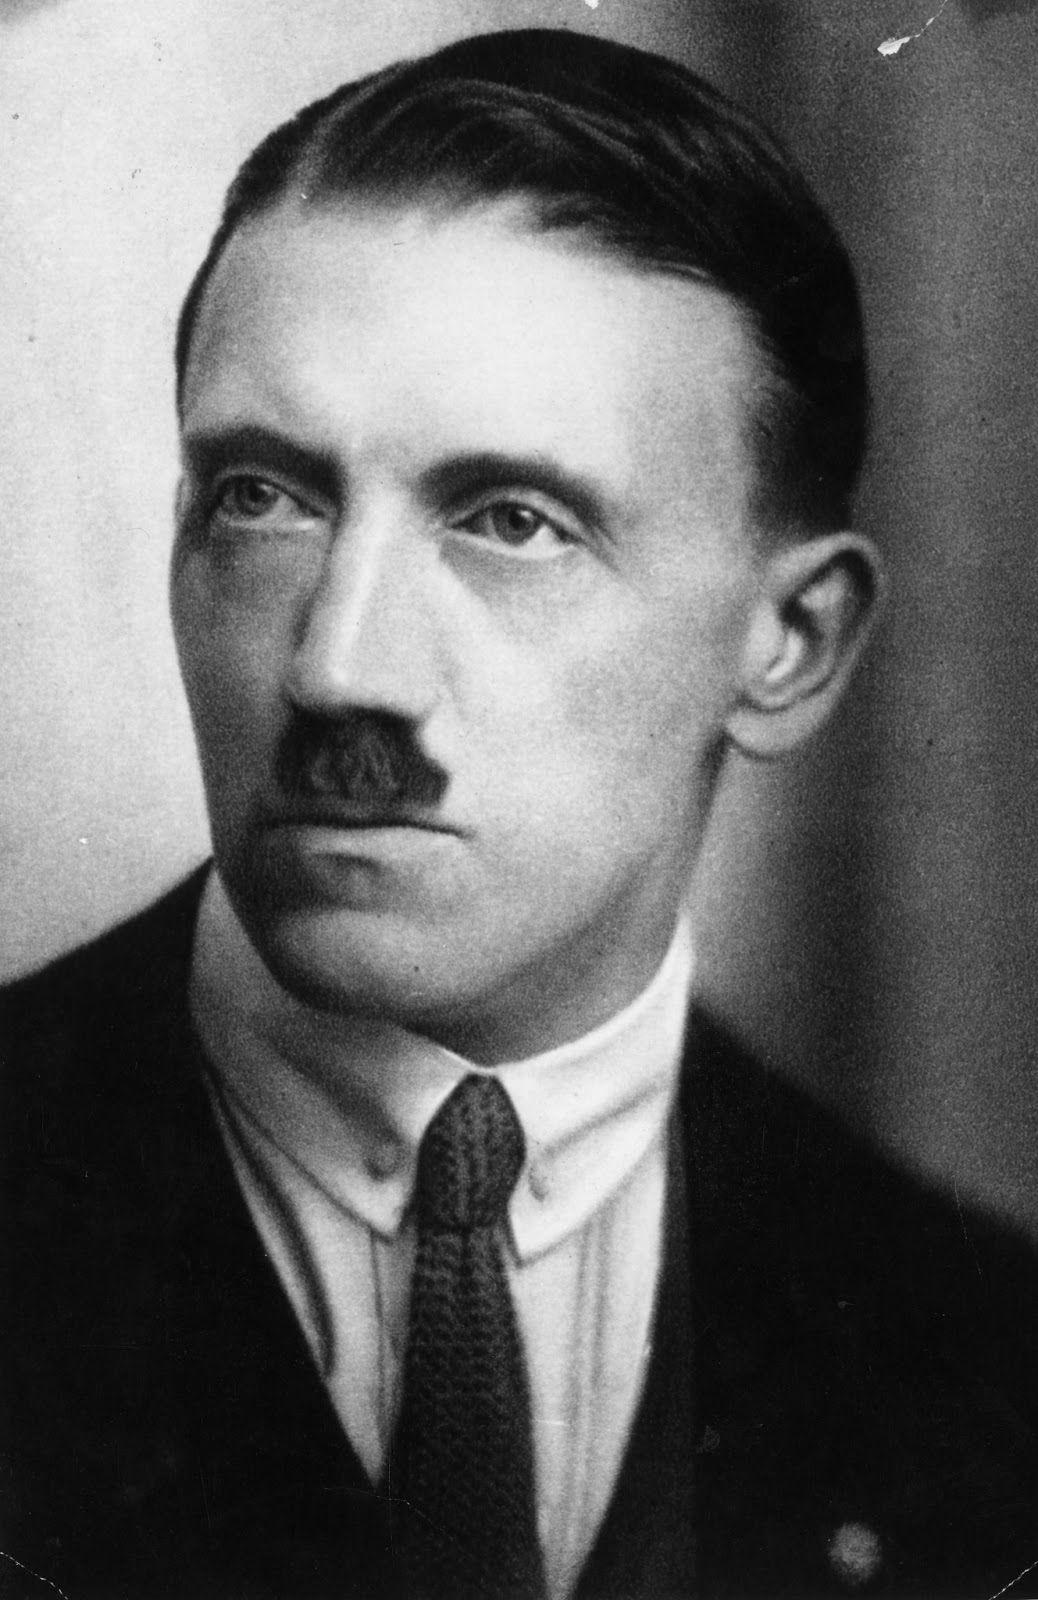 Adolf Hitler joven